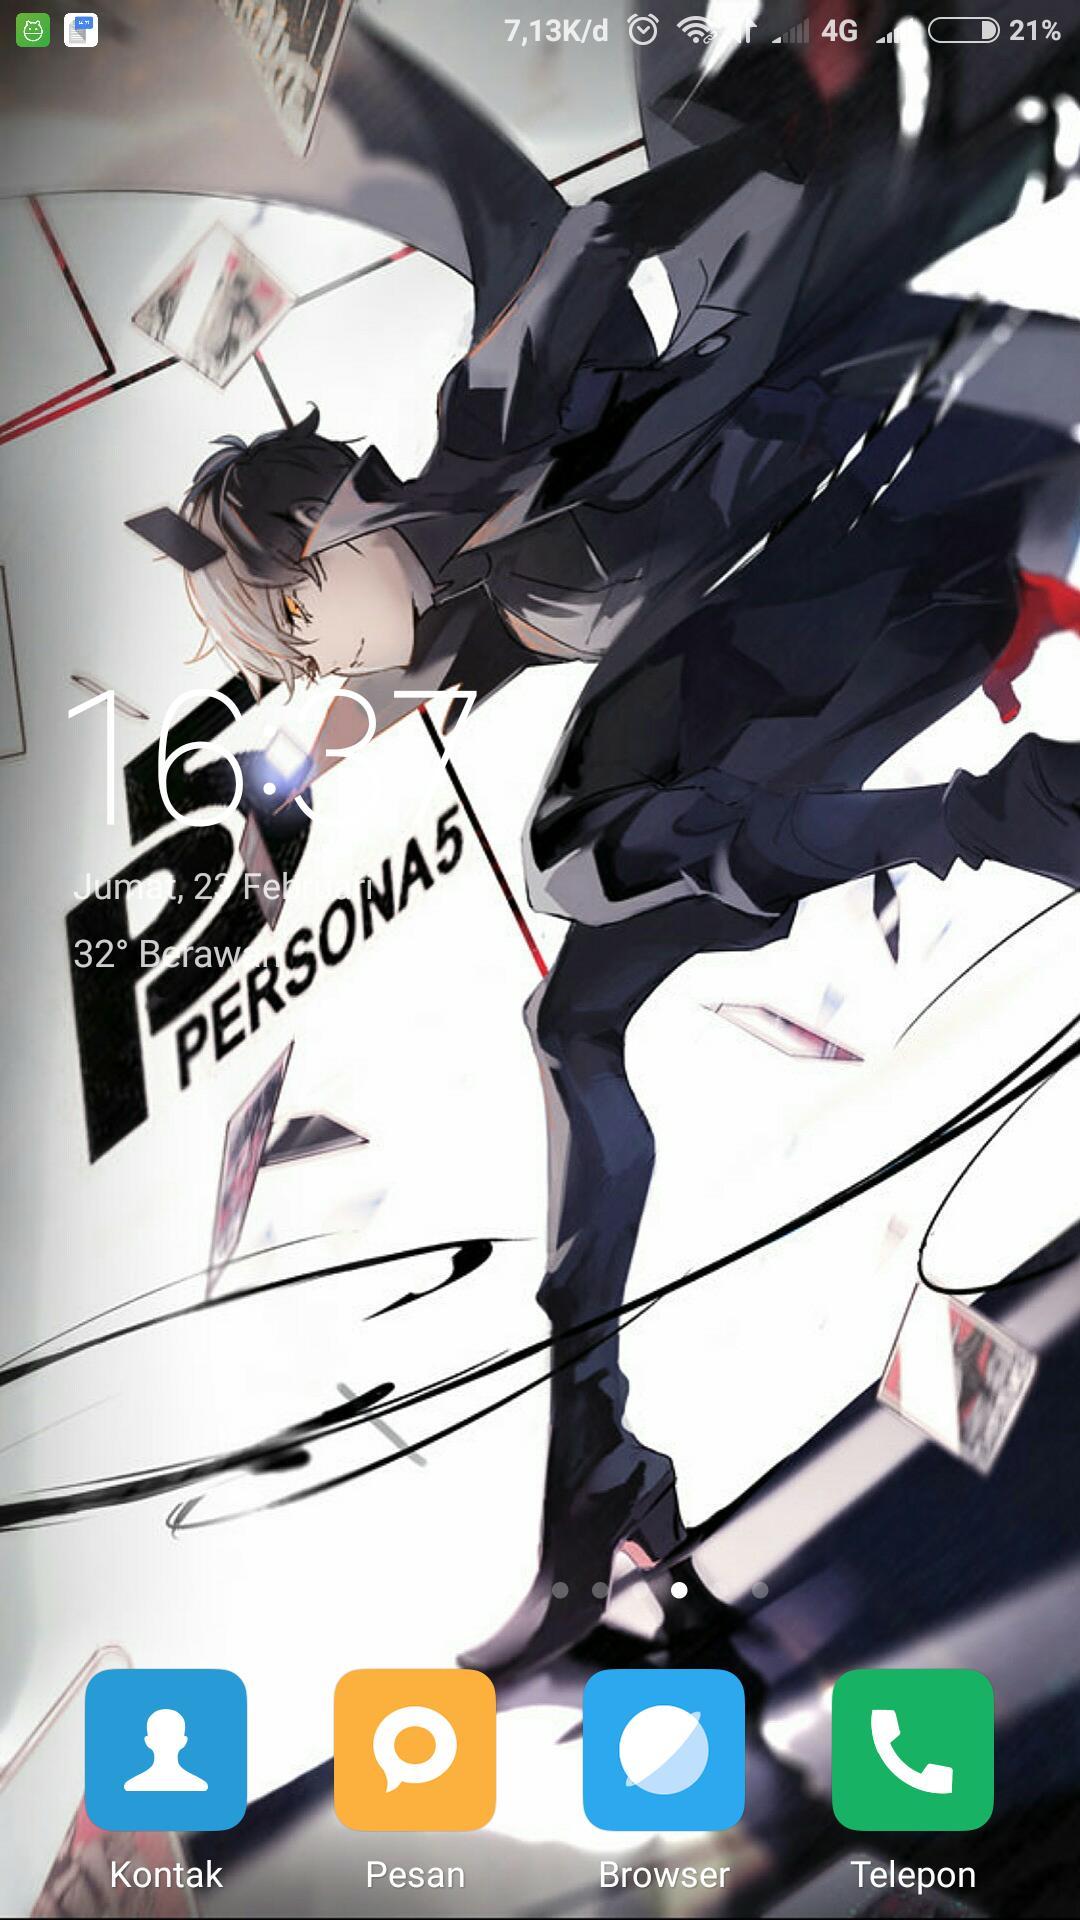 Android 用の Persona 5 Fansart The Animation Wallpaper Apk をダウンロード